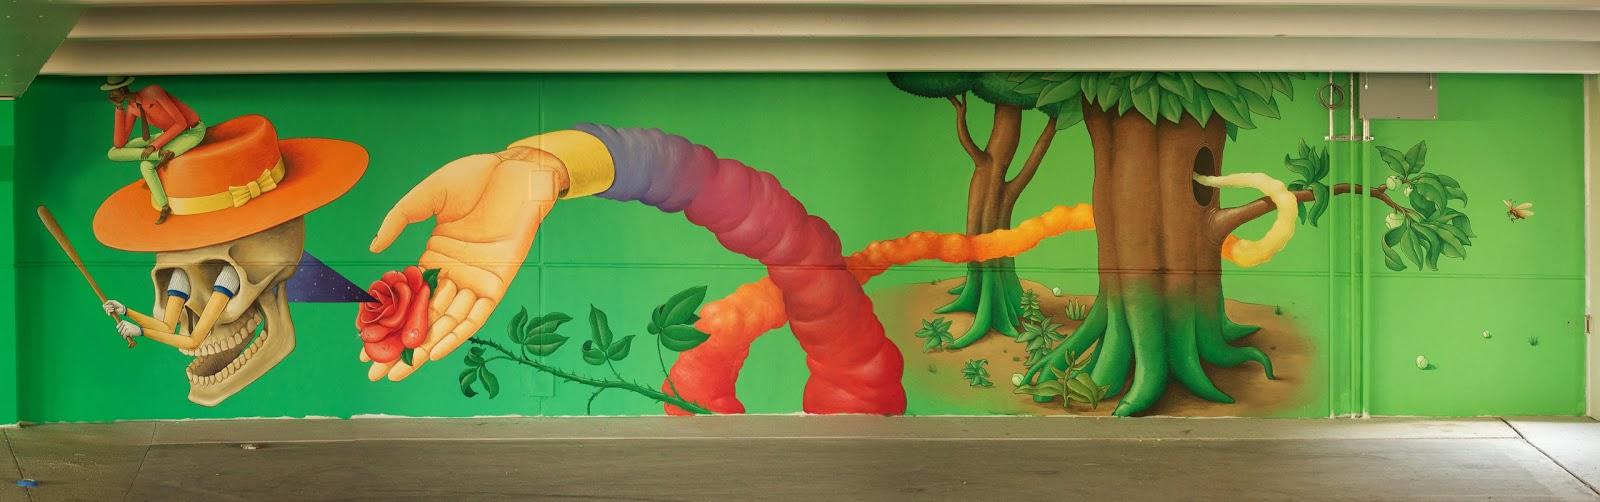 interesni-kazki-new-mural-library-street-collective-02